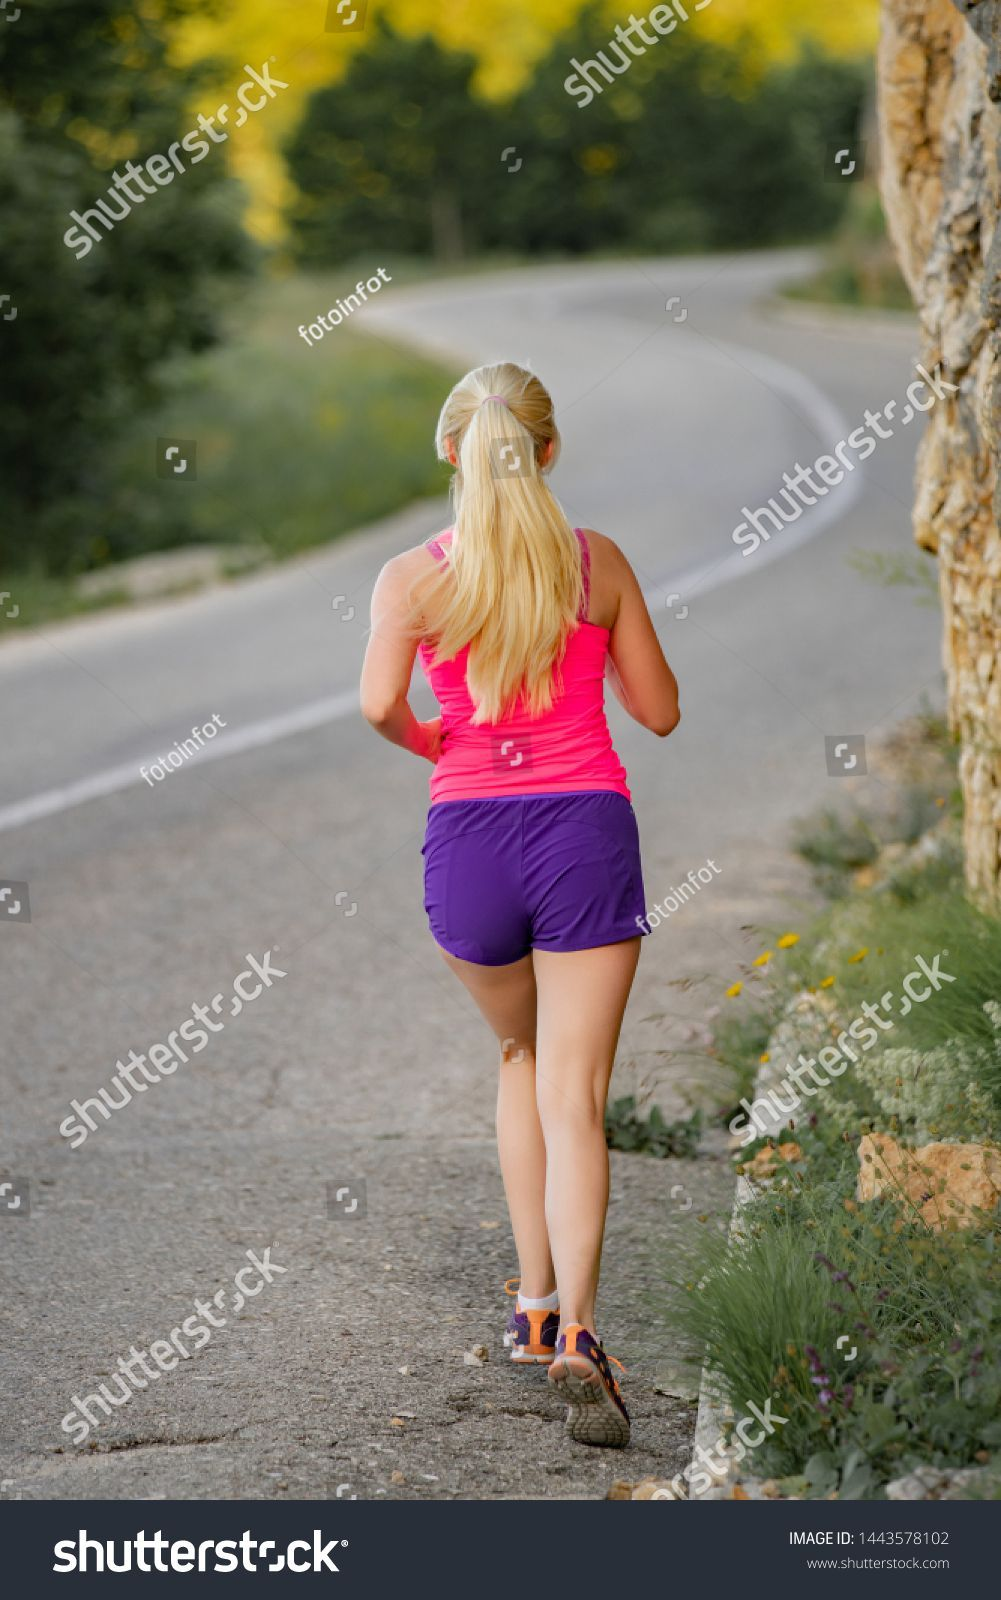 #woman#fitness#sport#running #sponsored  #fitness #running #summer #sport #woman #park #day #ad #in...